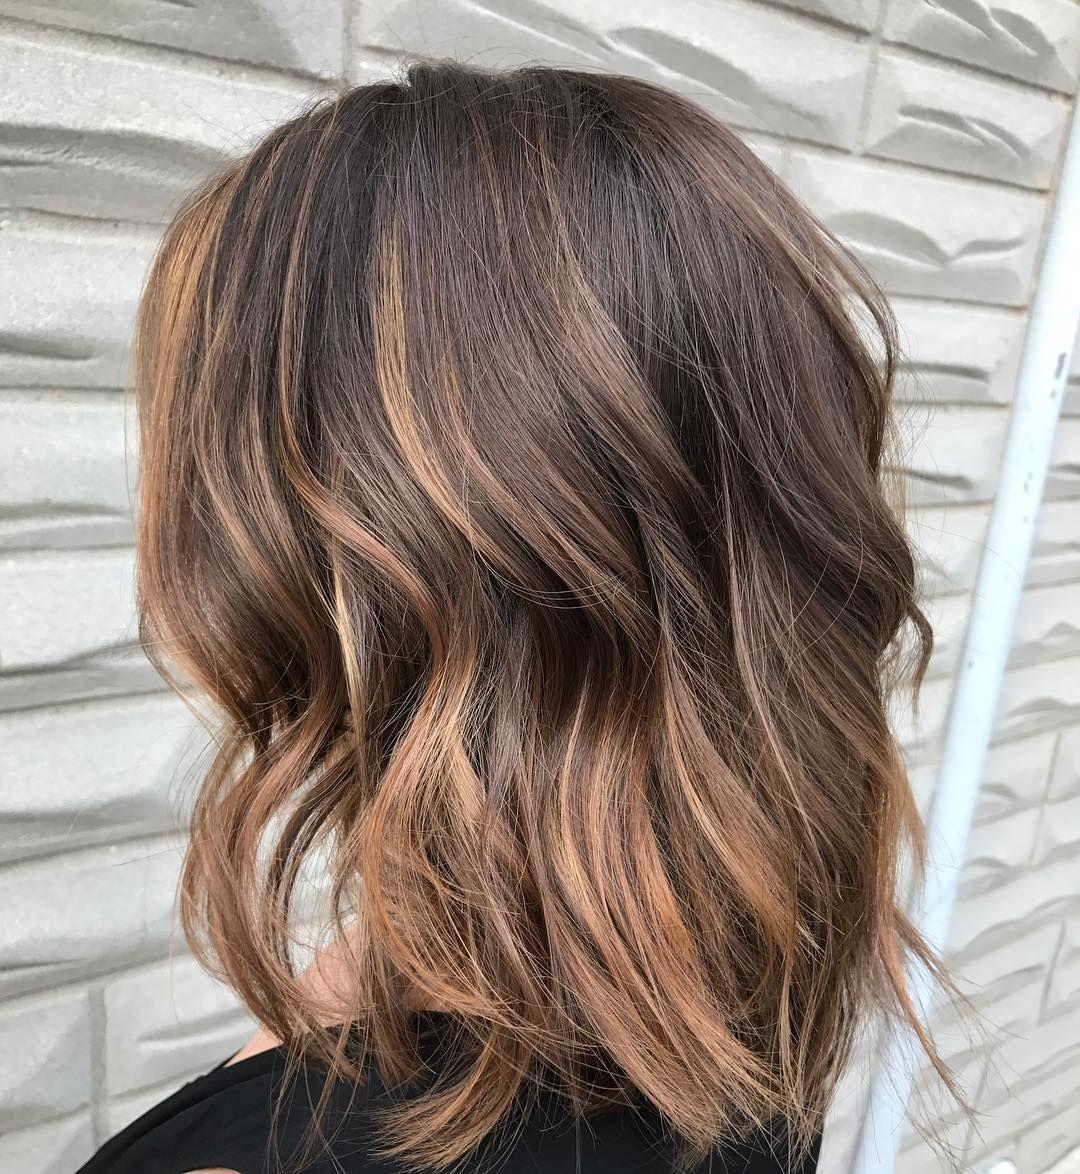 Балаяж на крашеные волосы